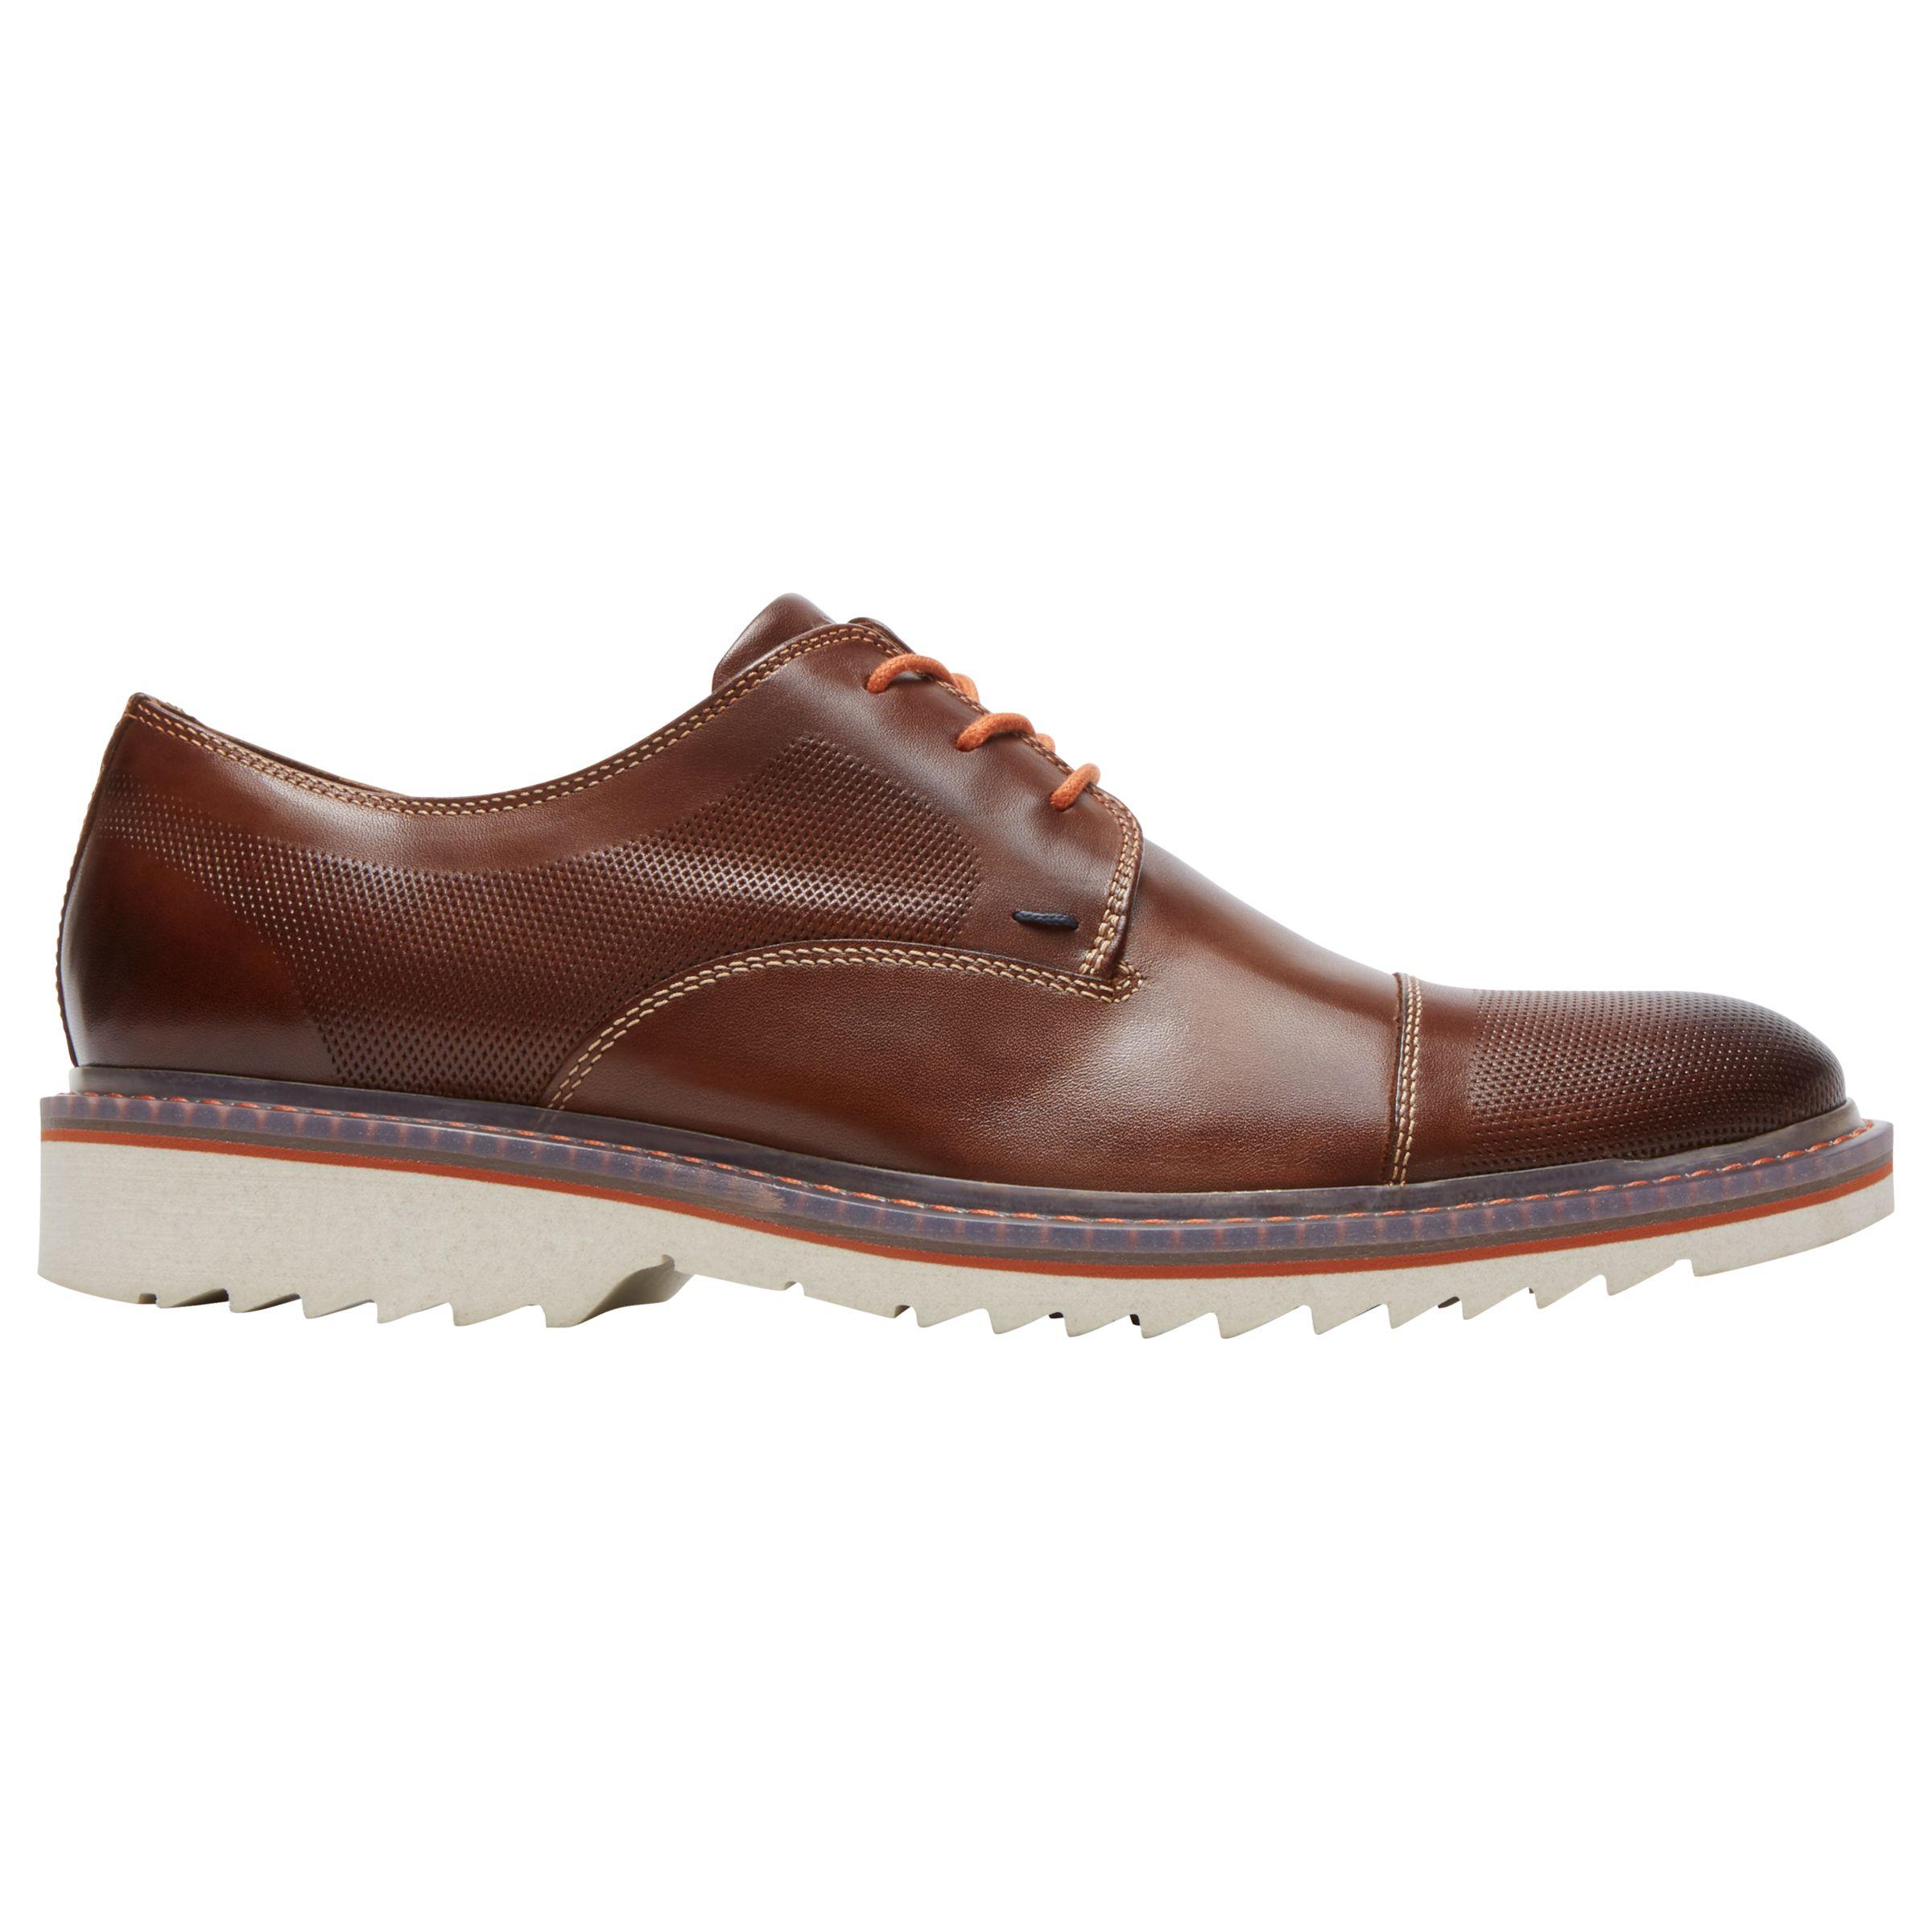 Rockport Rockport Jaxson Cap Toe Derby Shoes, Brow